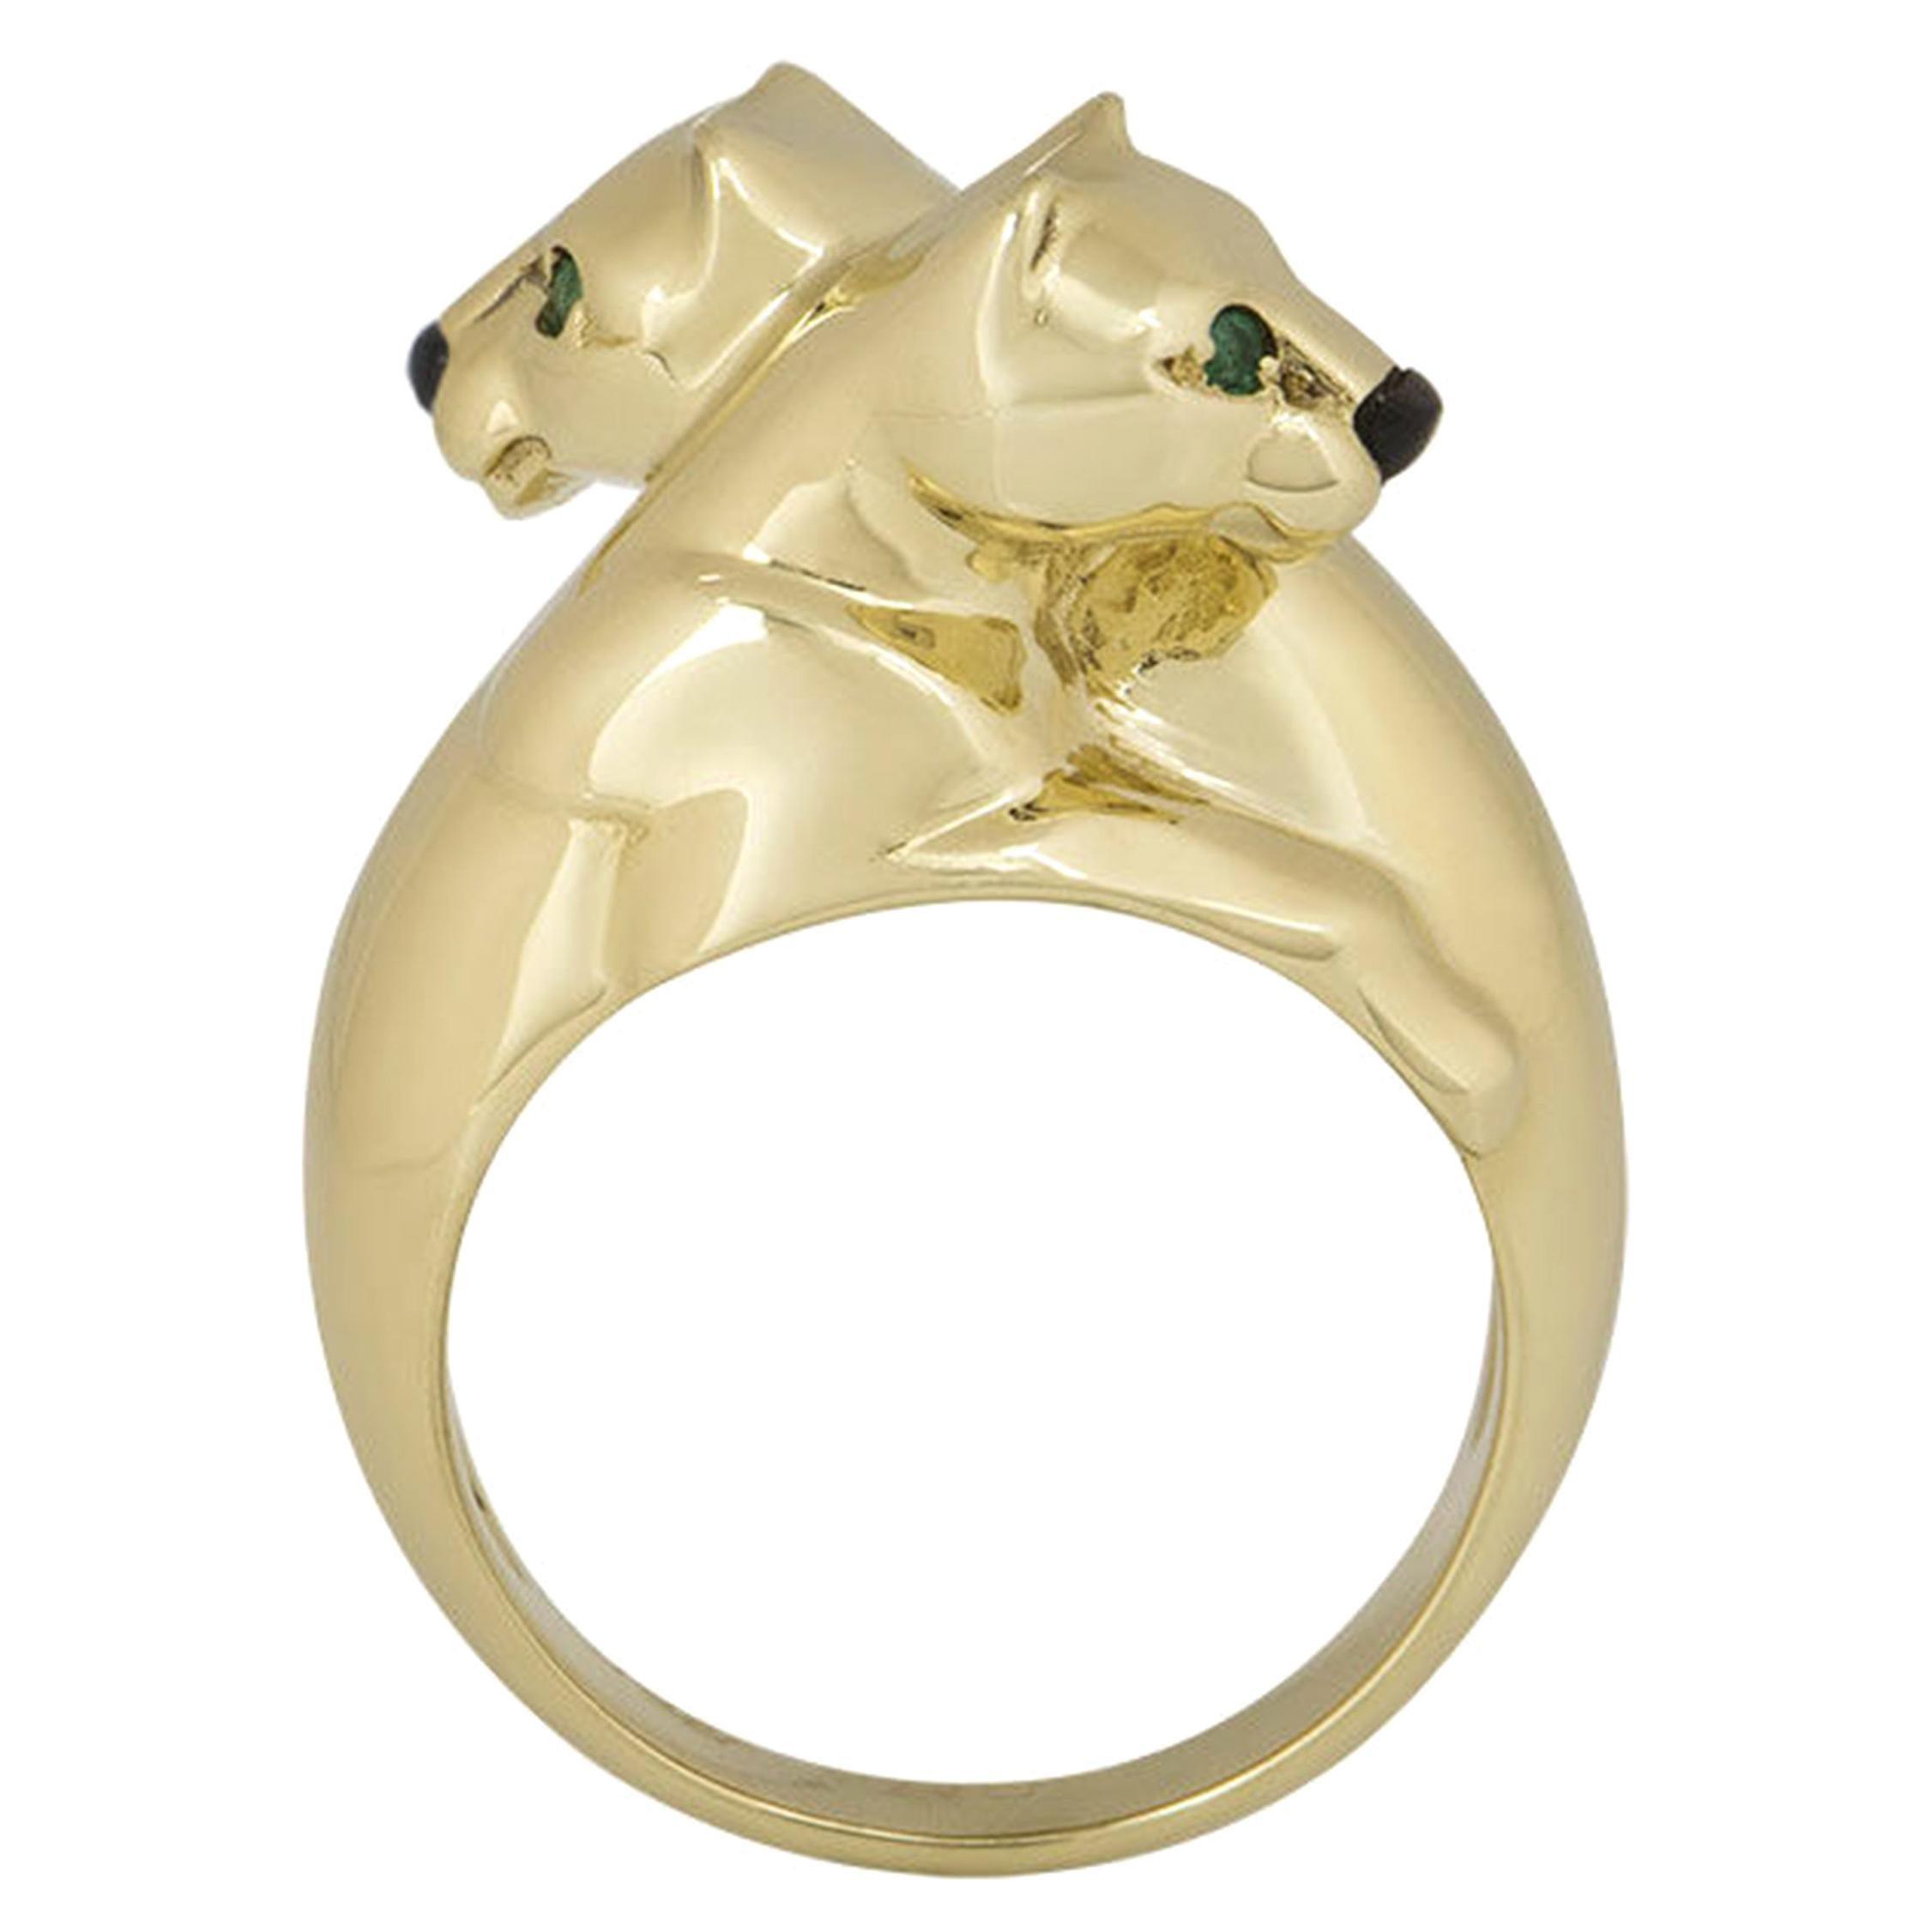 Cartier 18 Karat Yellow Gold Double Panthere De Cartier Ring